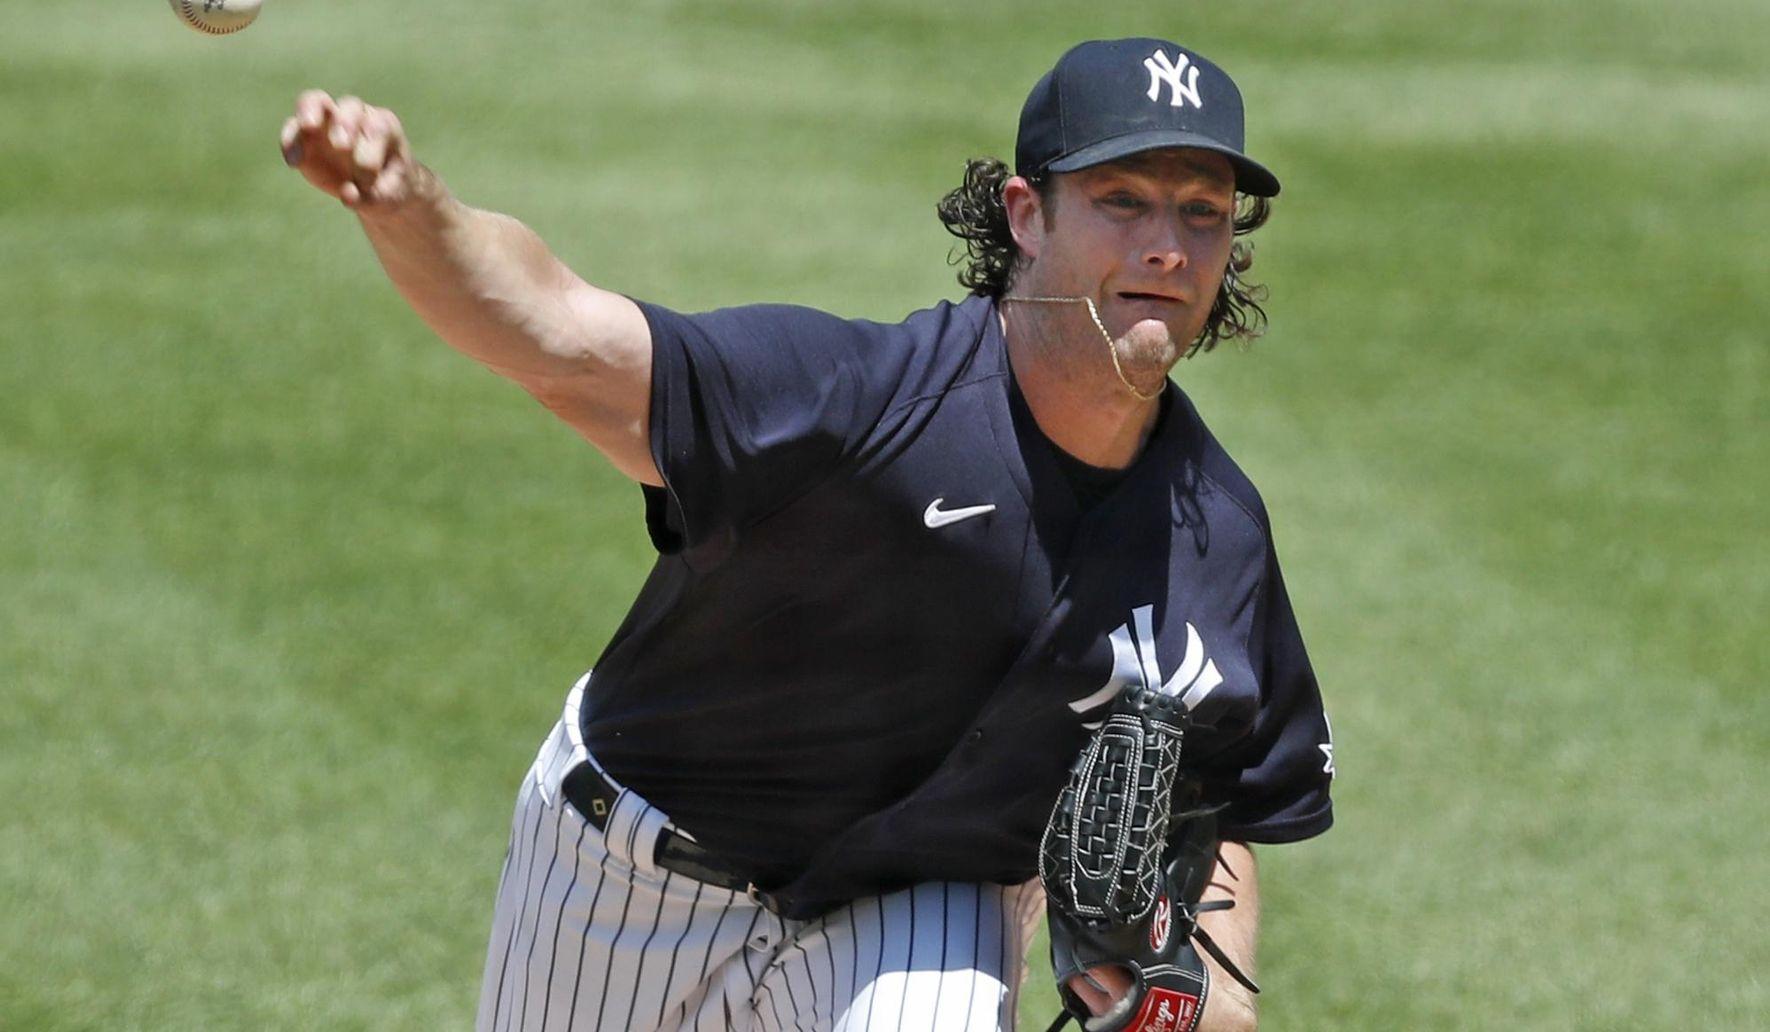 Yankees_baseball_12674_c0-84-1998-1248_s1770x1032